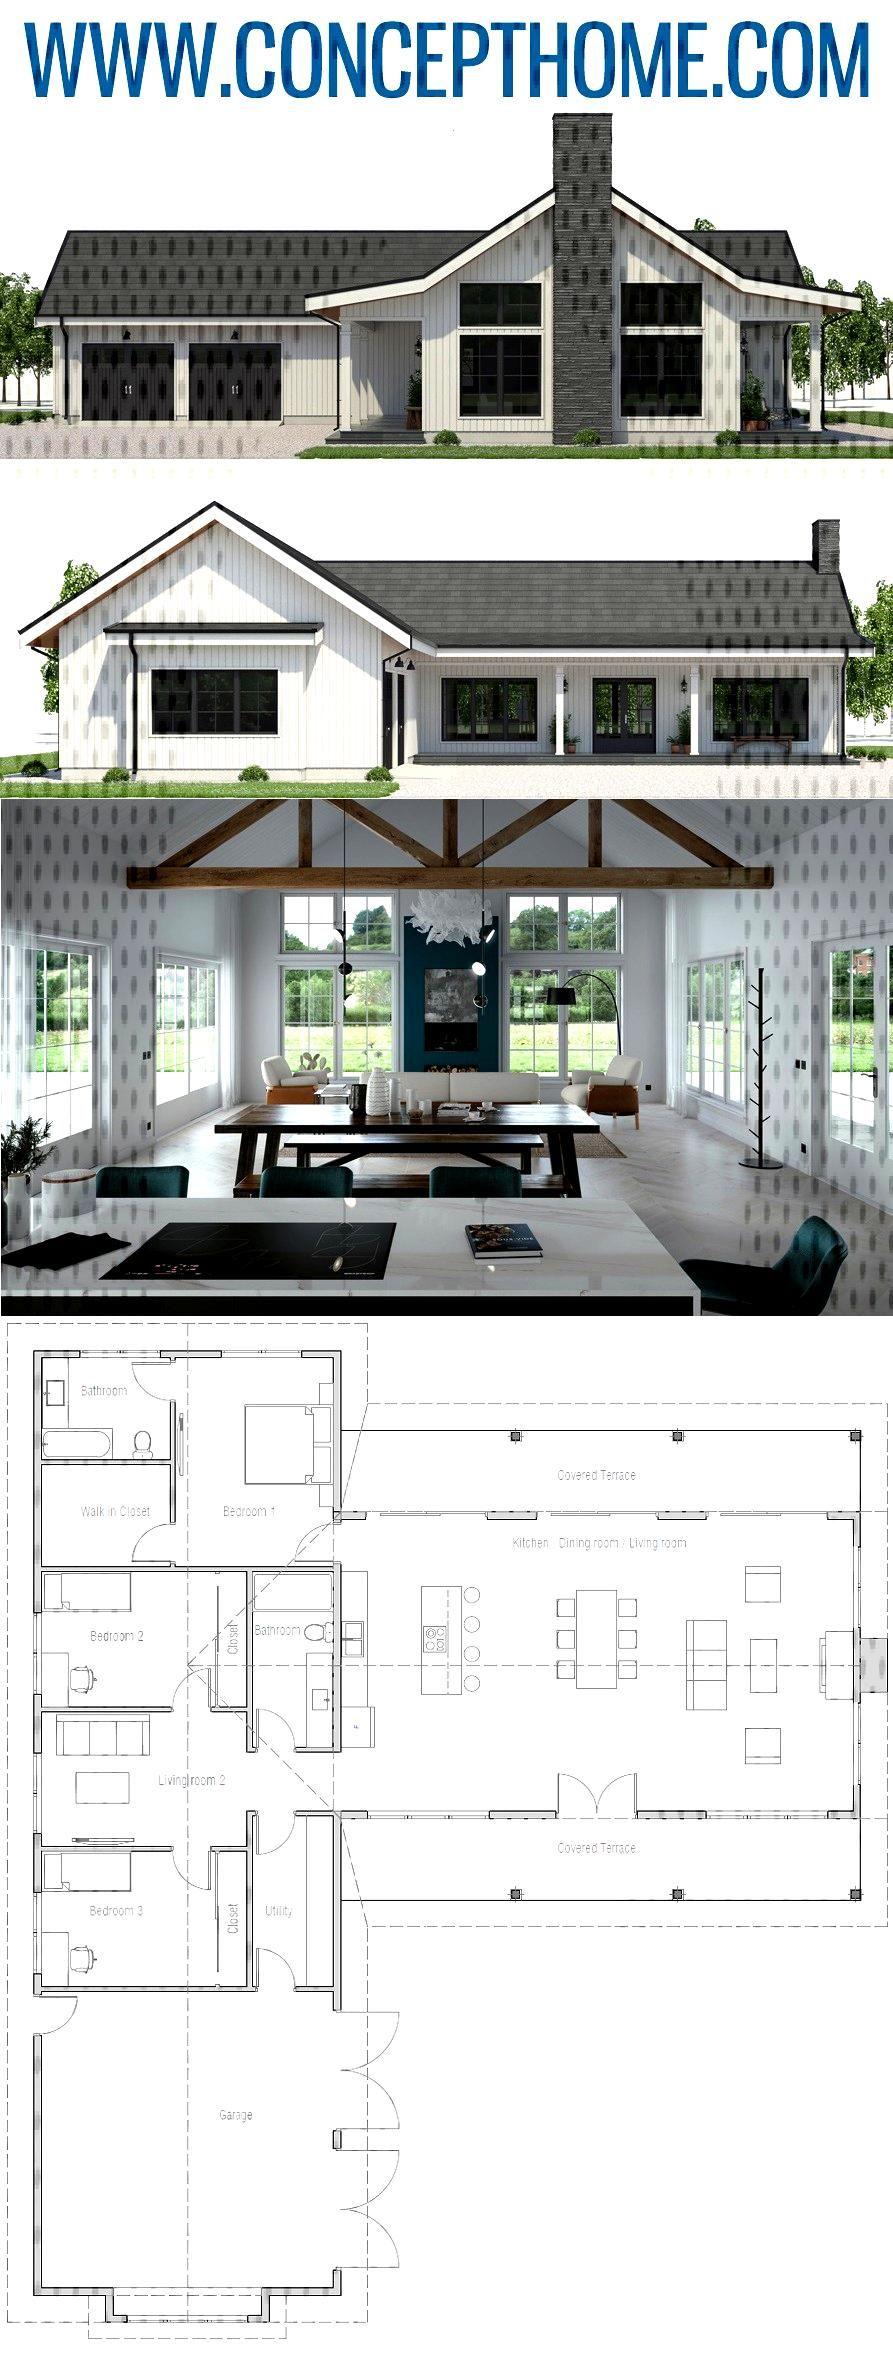 Home Plan CH567